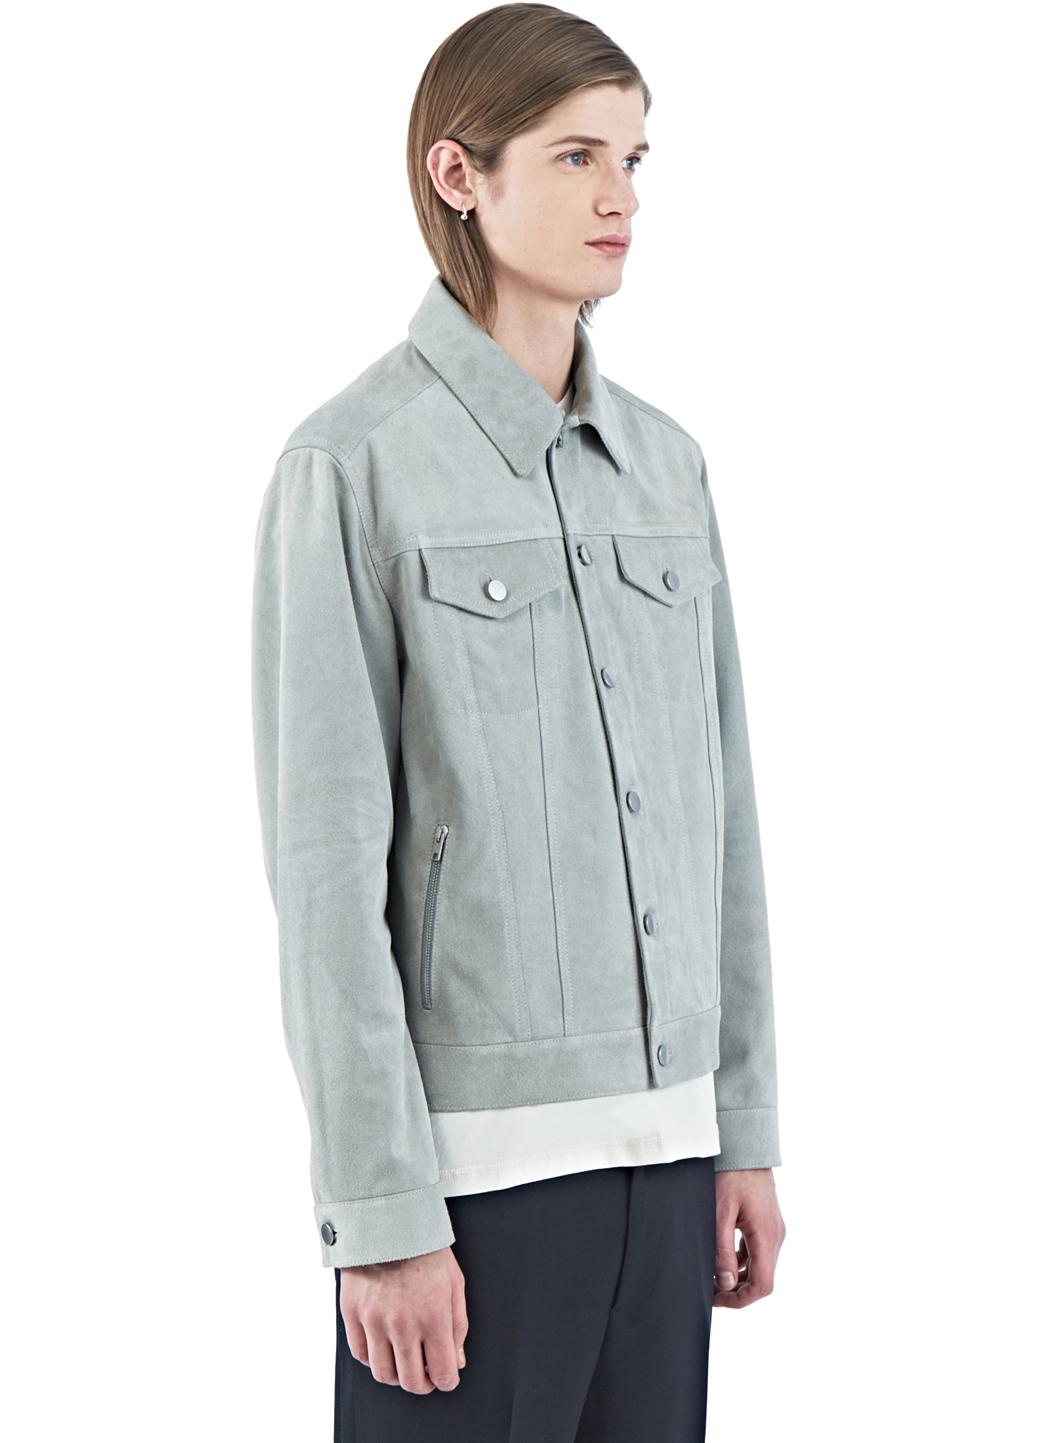 Yang Li Suede Denim-style Jacket in Blue for Men